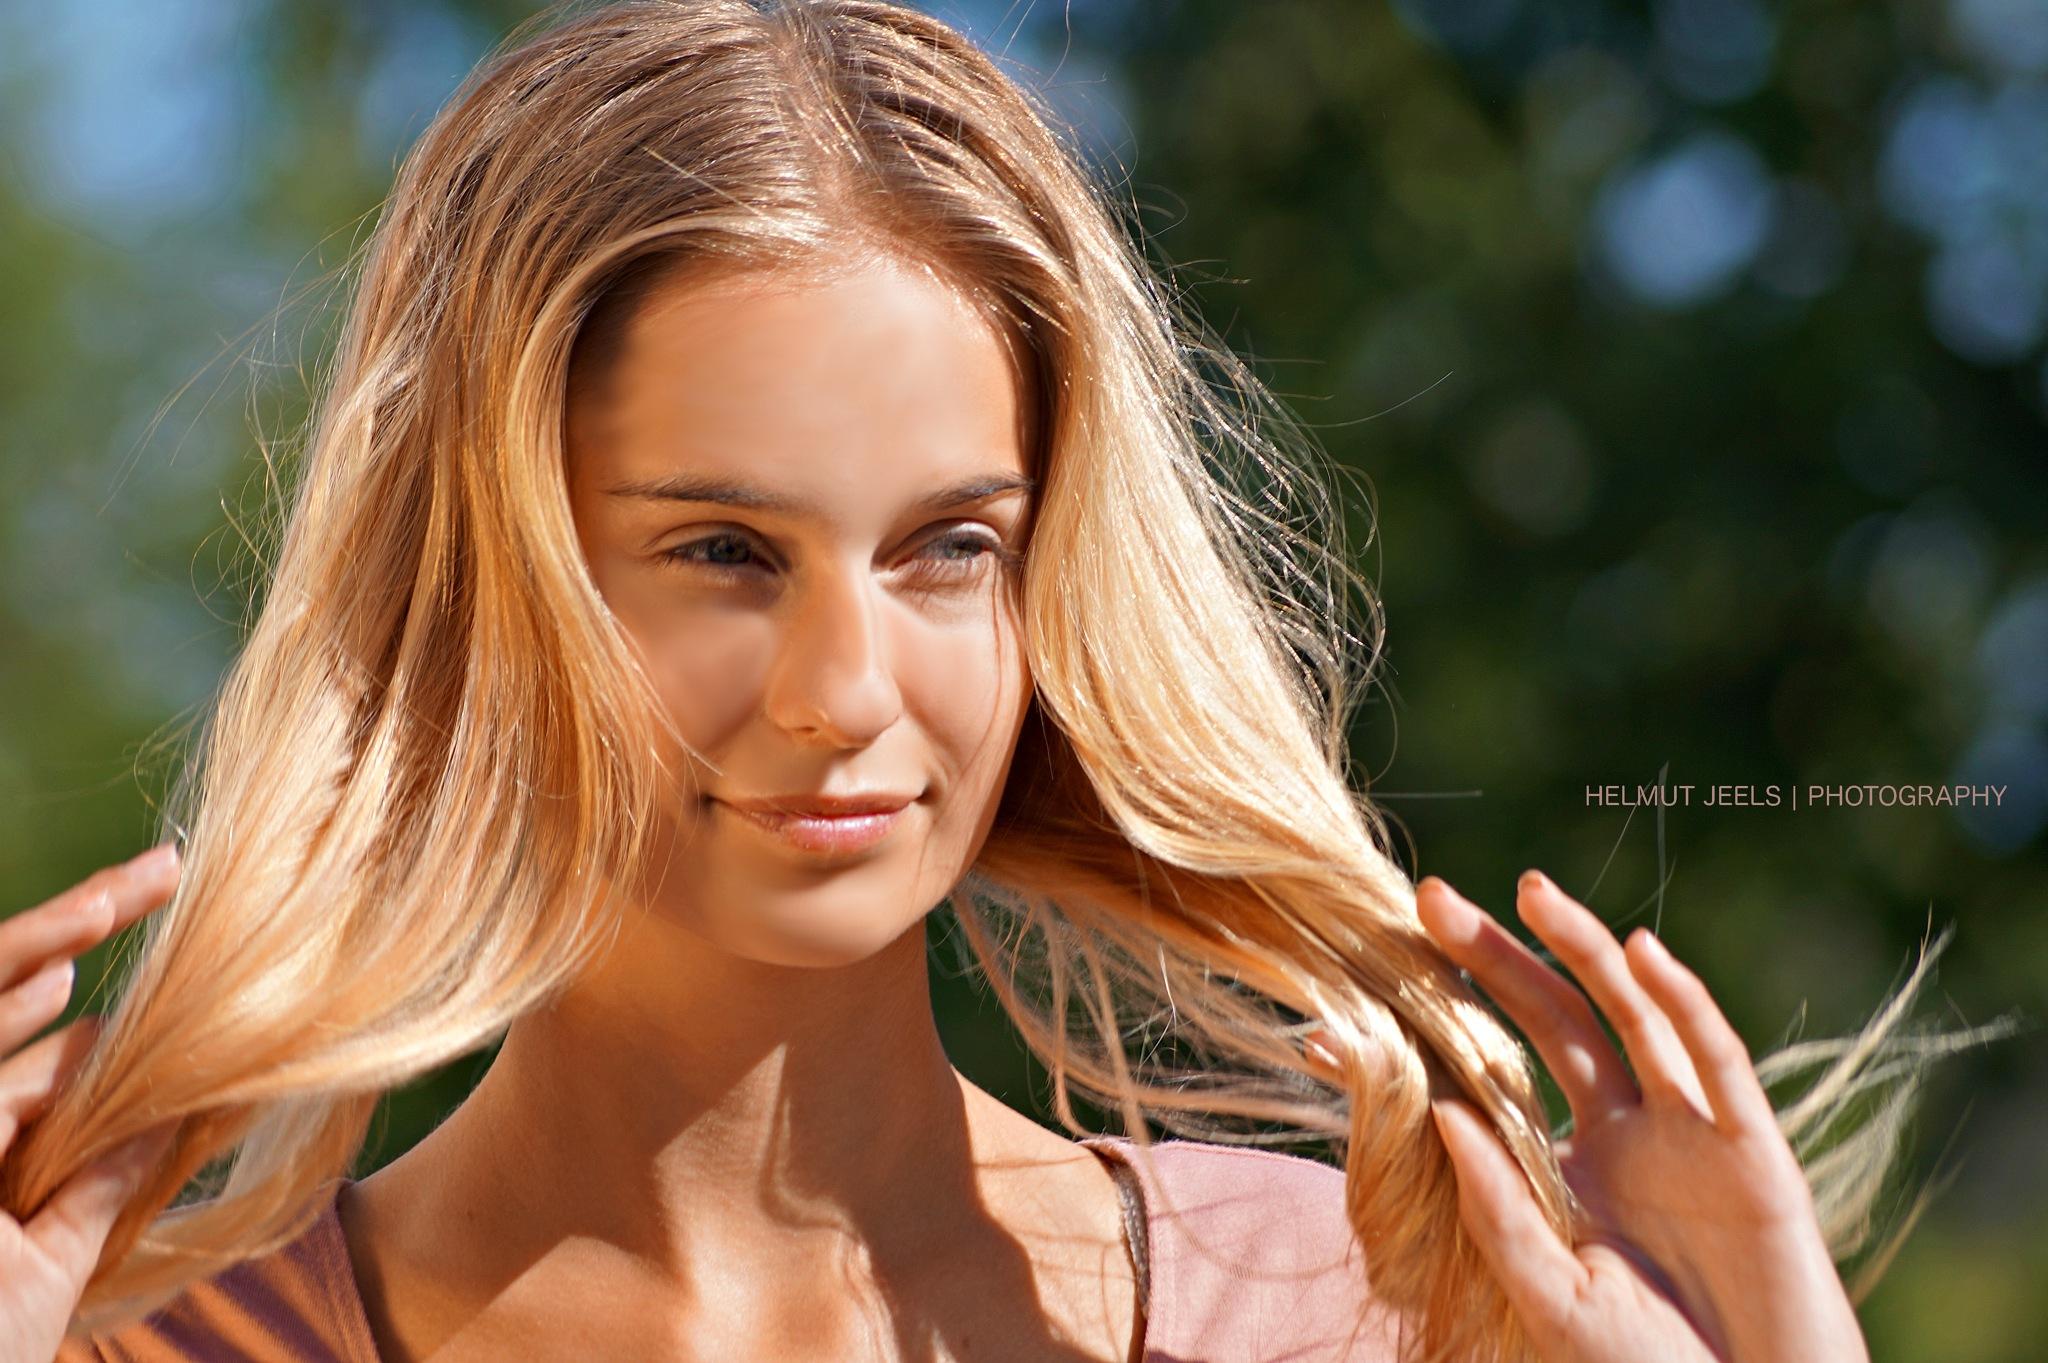 Photo in Portrait #face #fashion #streetfashion #magzzine #jeels #photo #photography #olivia #tegelberg #sweden #orust #summer #pink #beauty #beautiful #model #woman #girl #hair #eyes #portrait